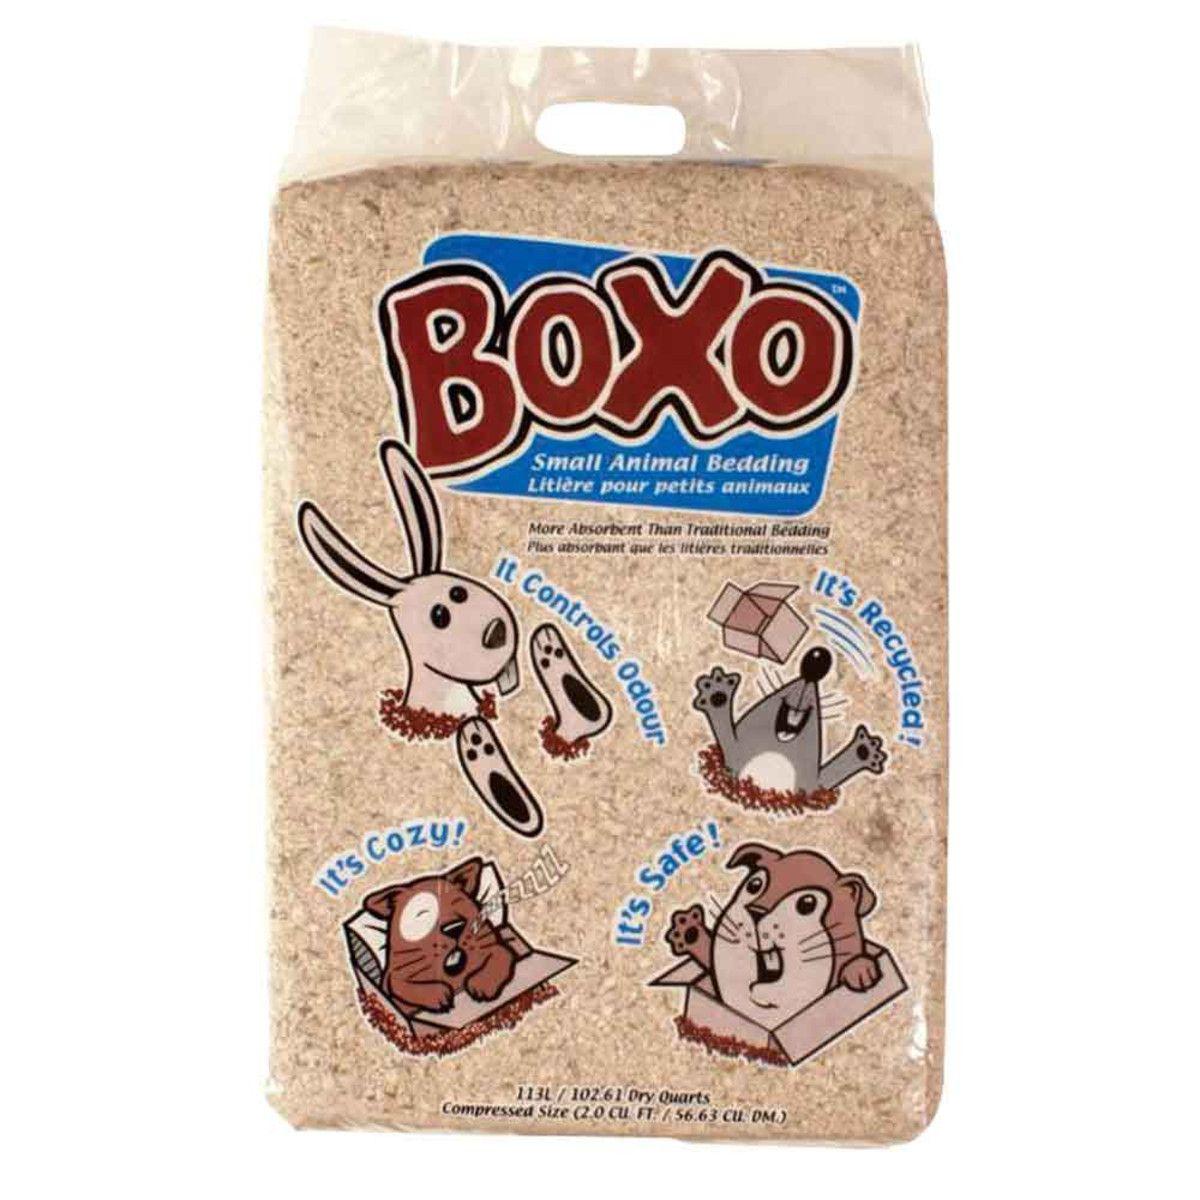 Boxo Small Animal Bedding 184 L Small Pets Small Animal Bedding Animals